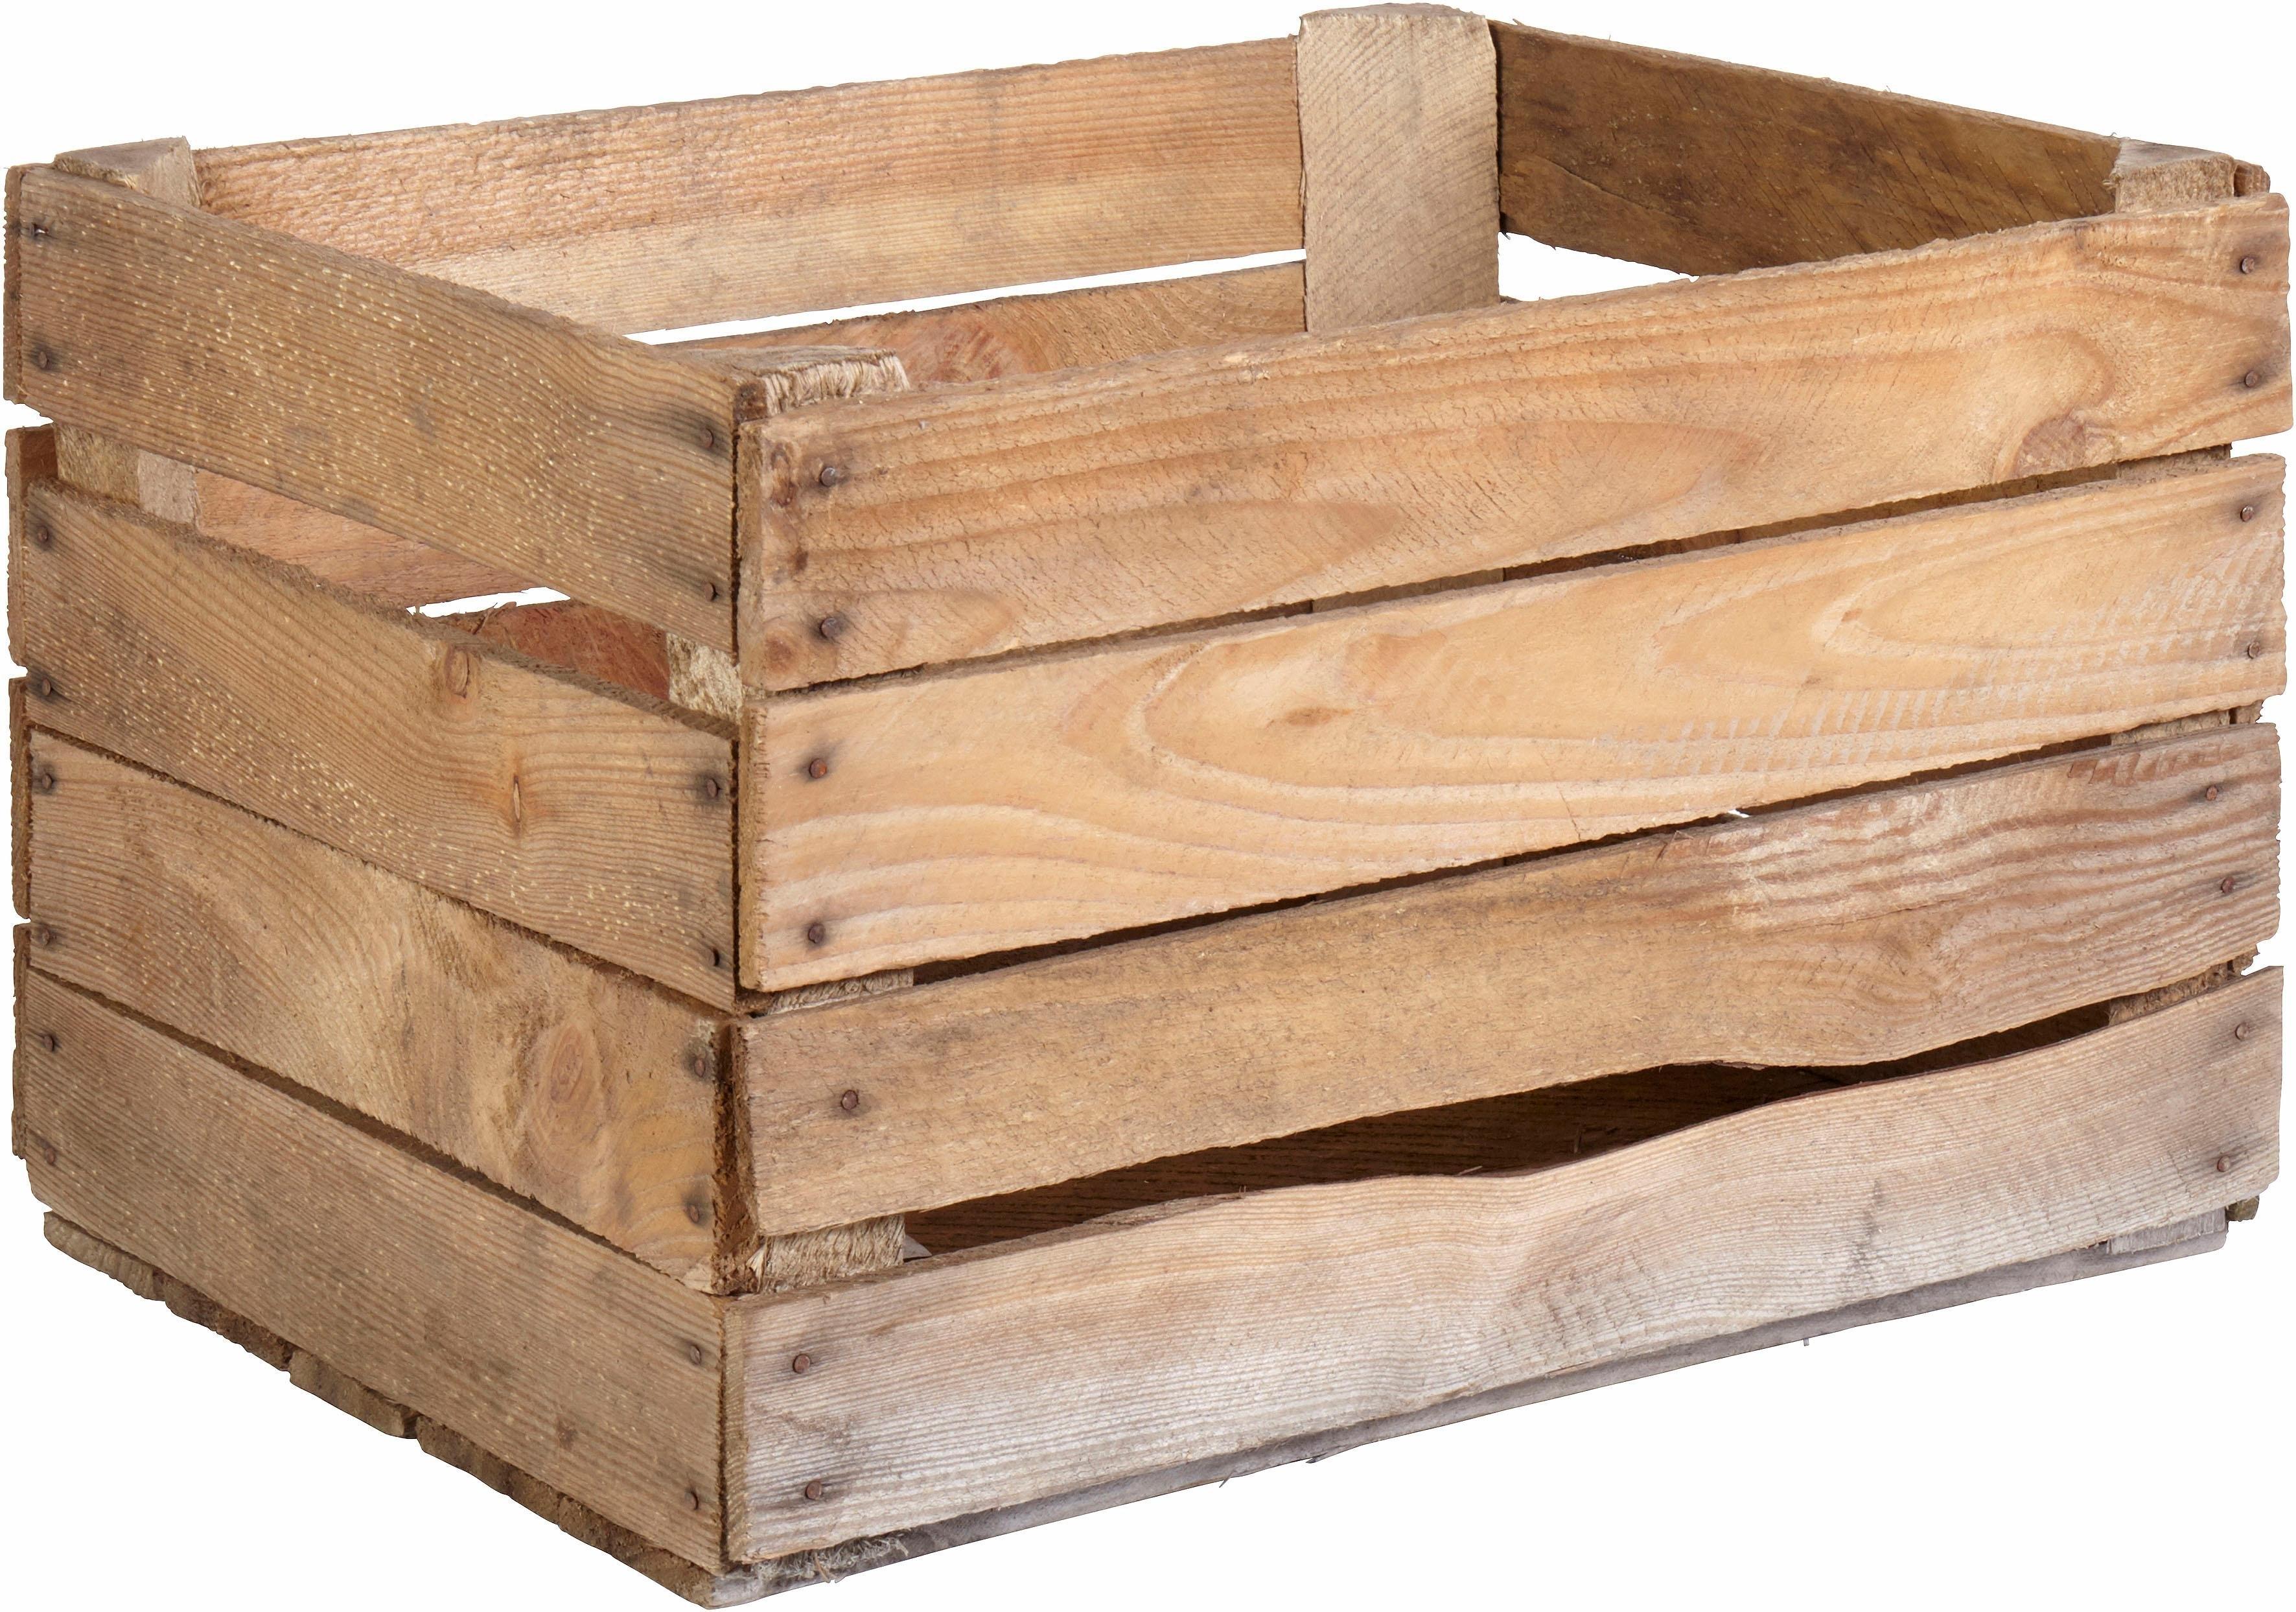 HOME AFFAIRE houten kist makkelijk gekocht | OTTO